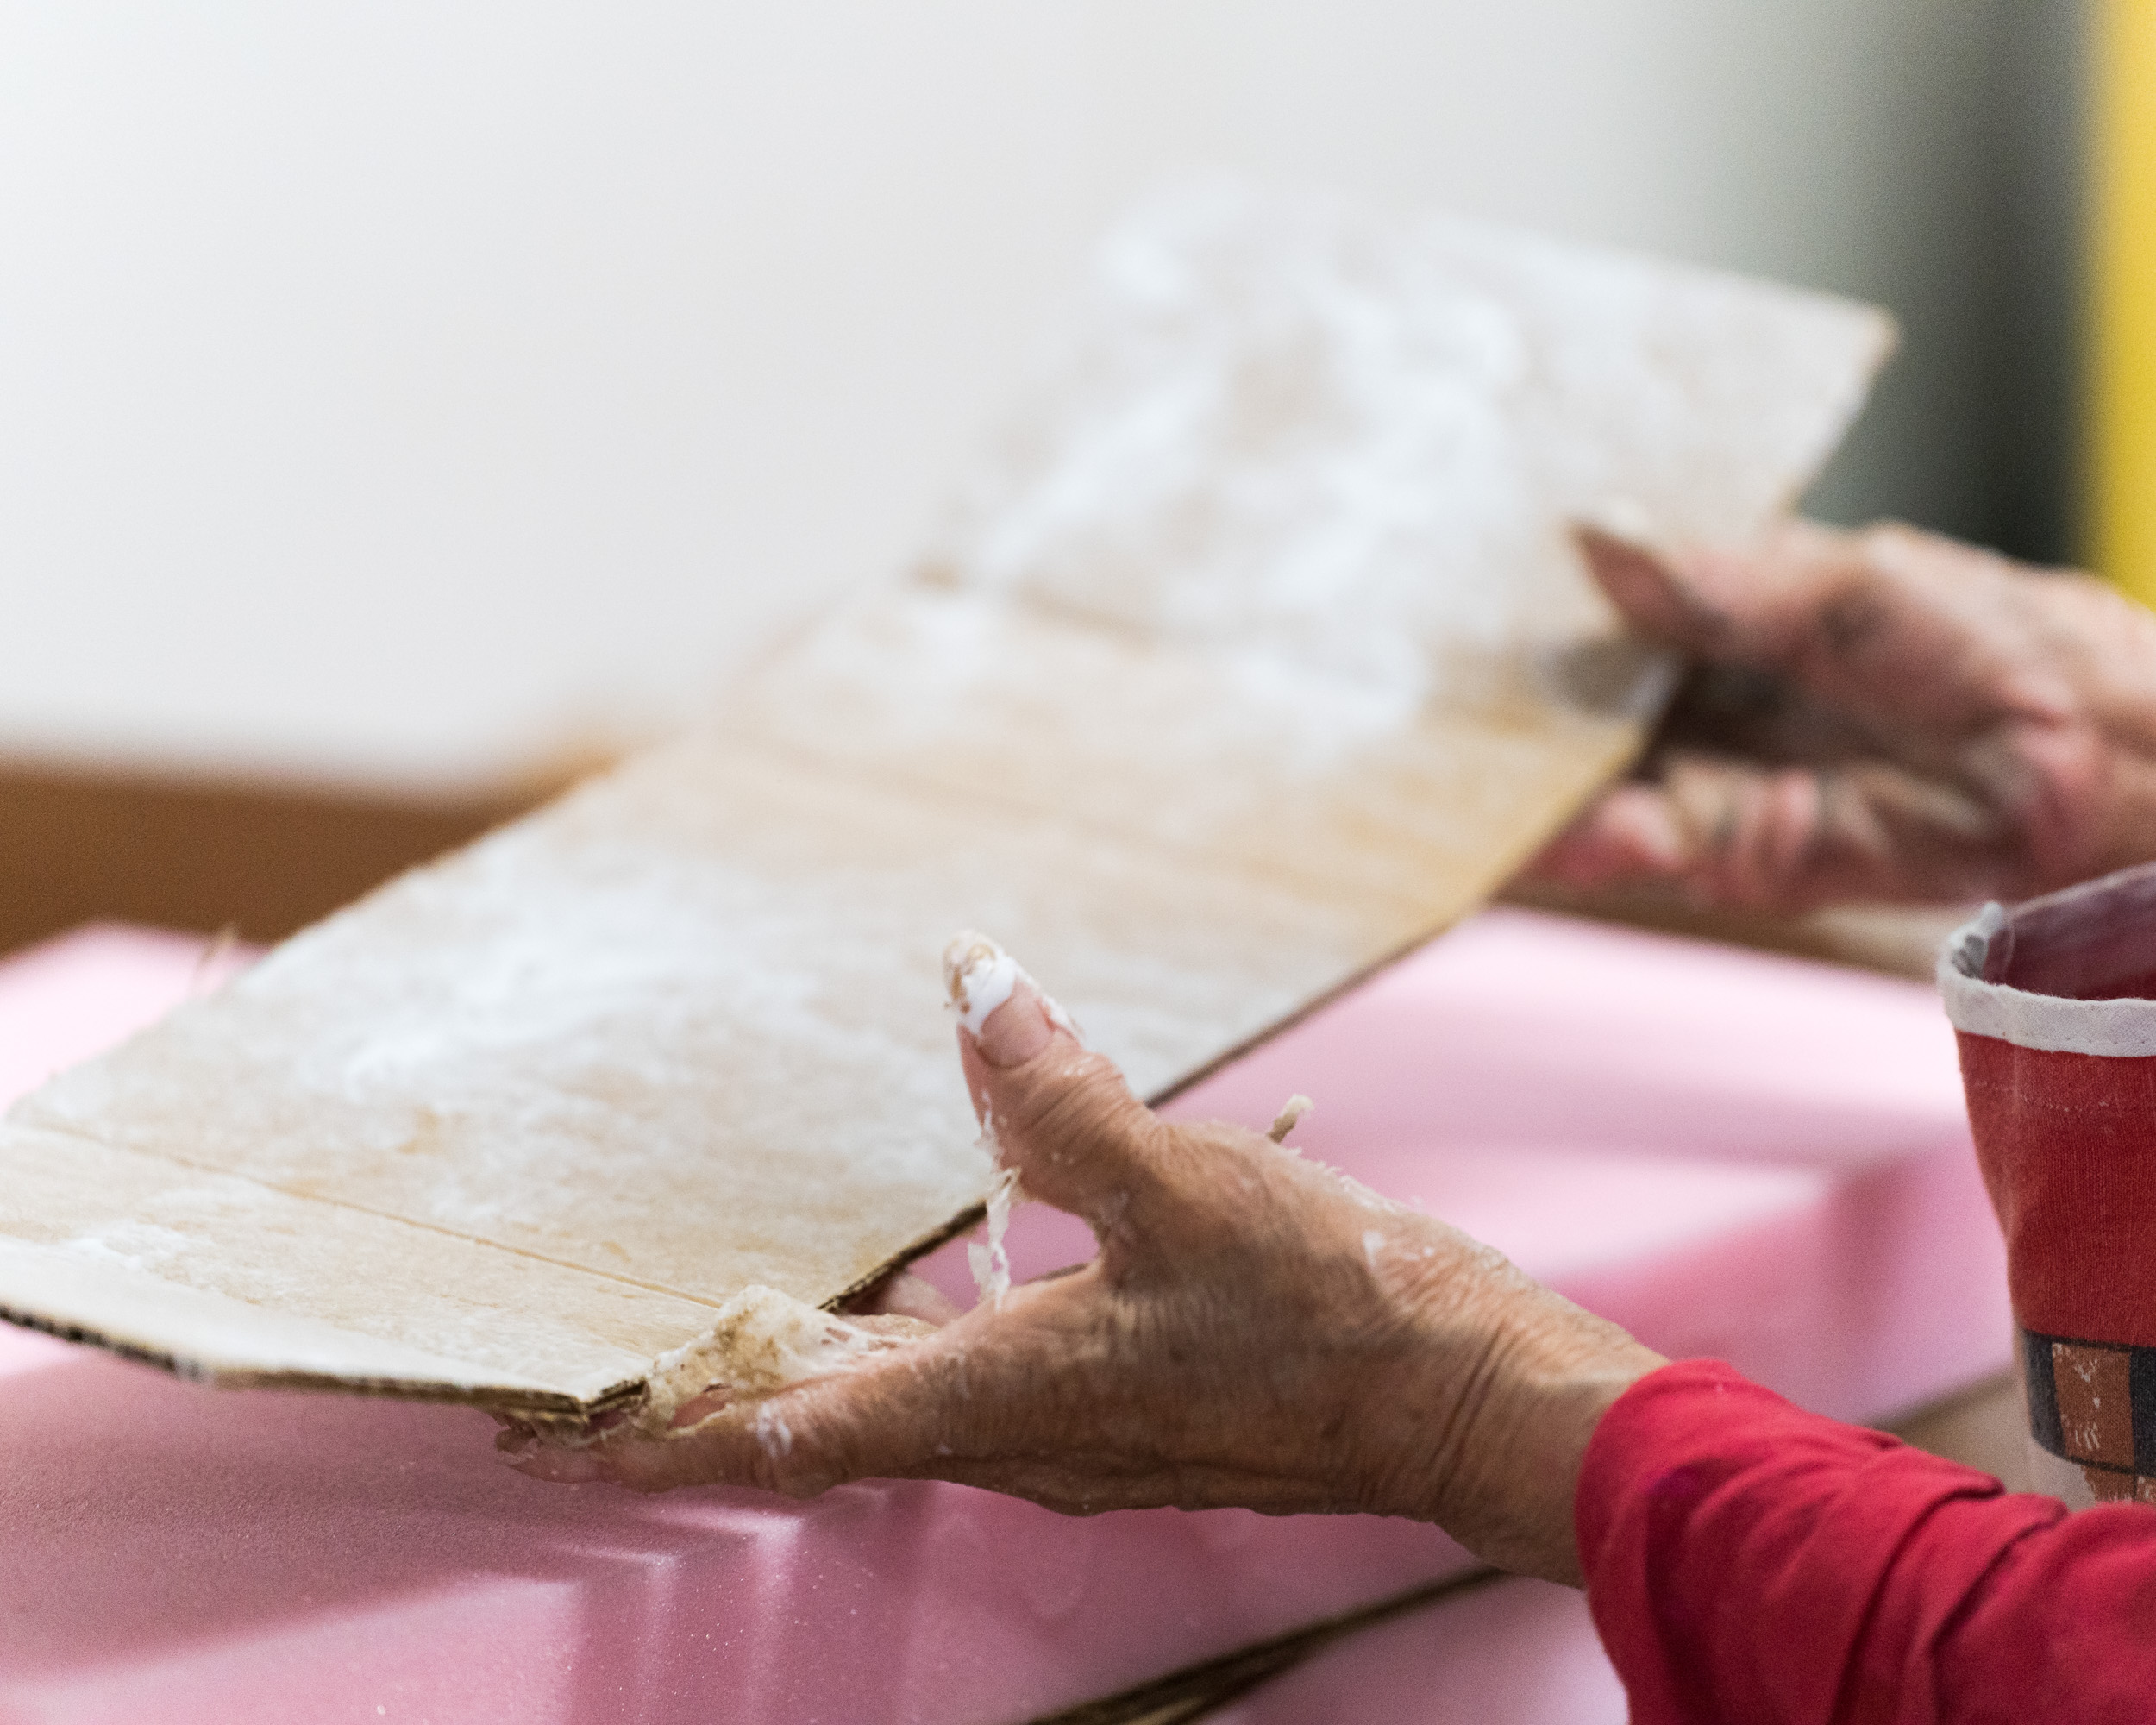 A woman's hands folding cardboard